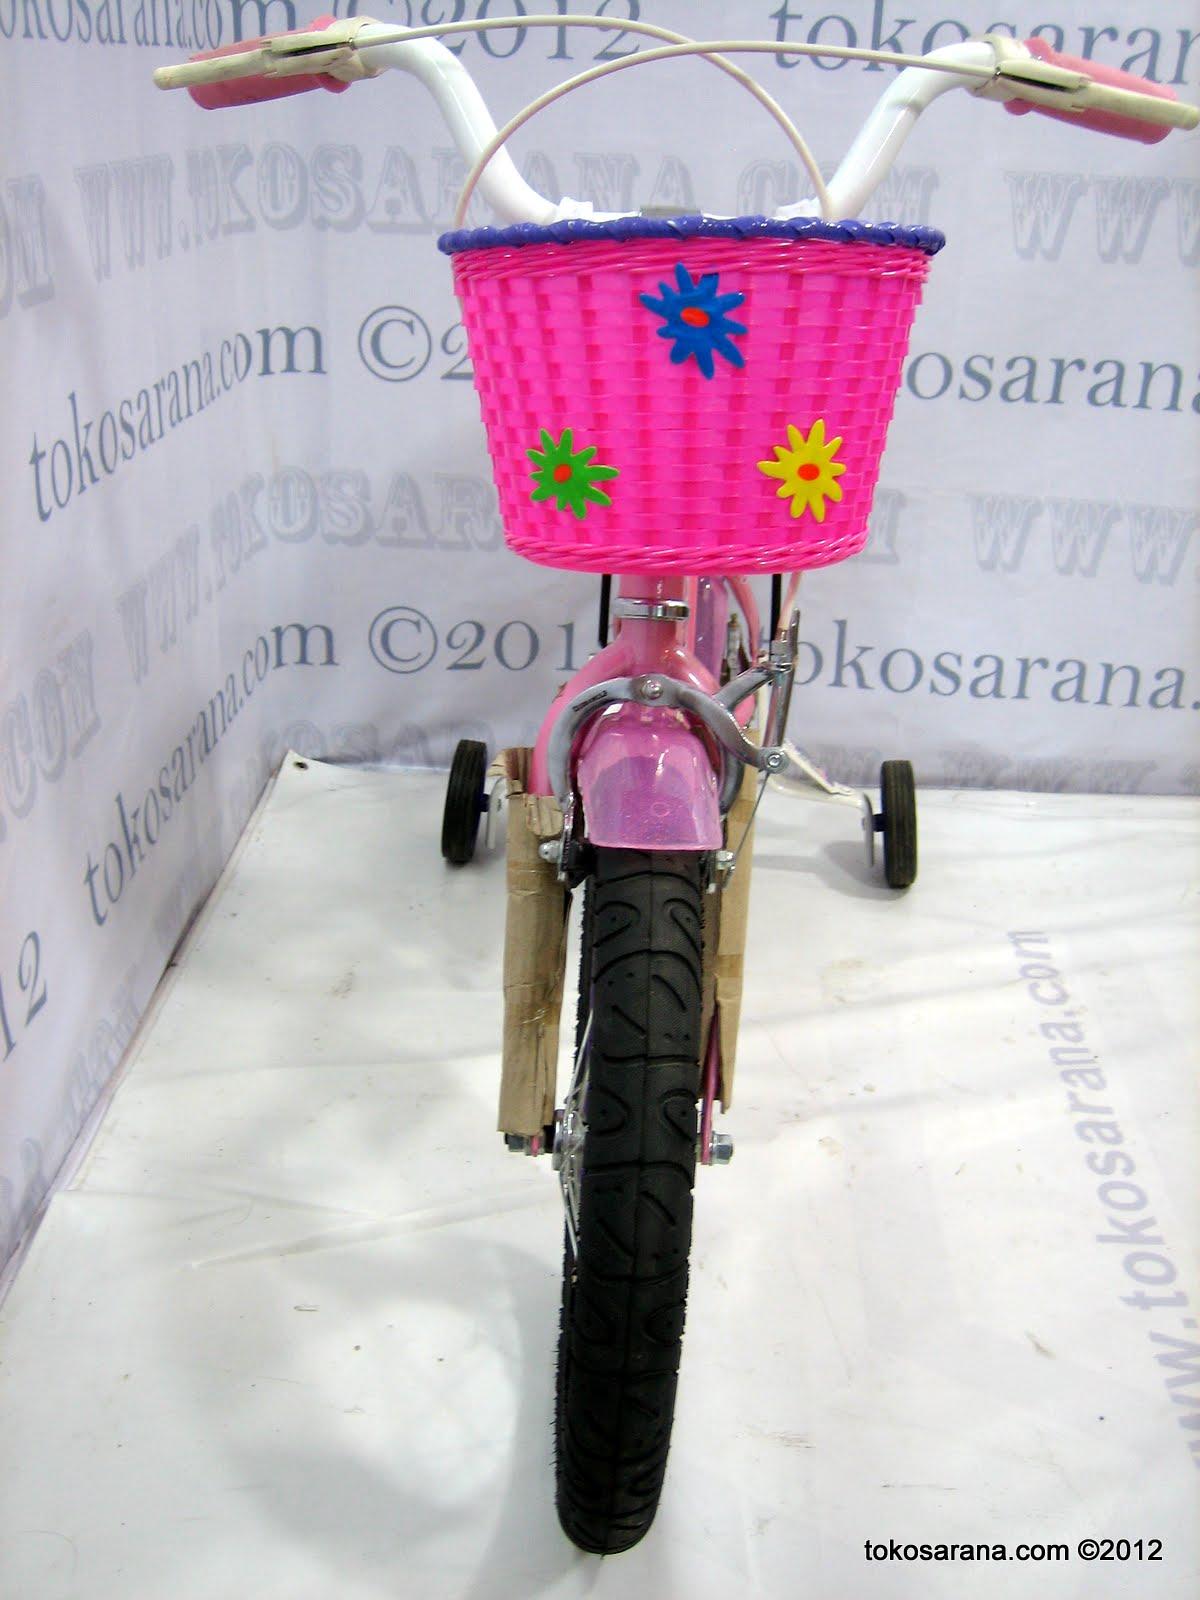 http://2.bp.blogspot.com/-QjWkCcshD_I/T2Lt5xLK3oI/AAAAAAAAPyA/vLRf-W4ReSo/s1600/16+wimcycle+jolly+special+edition+%25283%2529.JPG